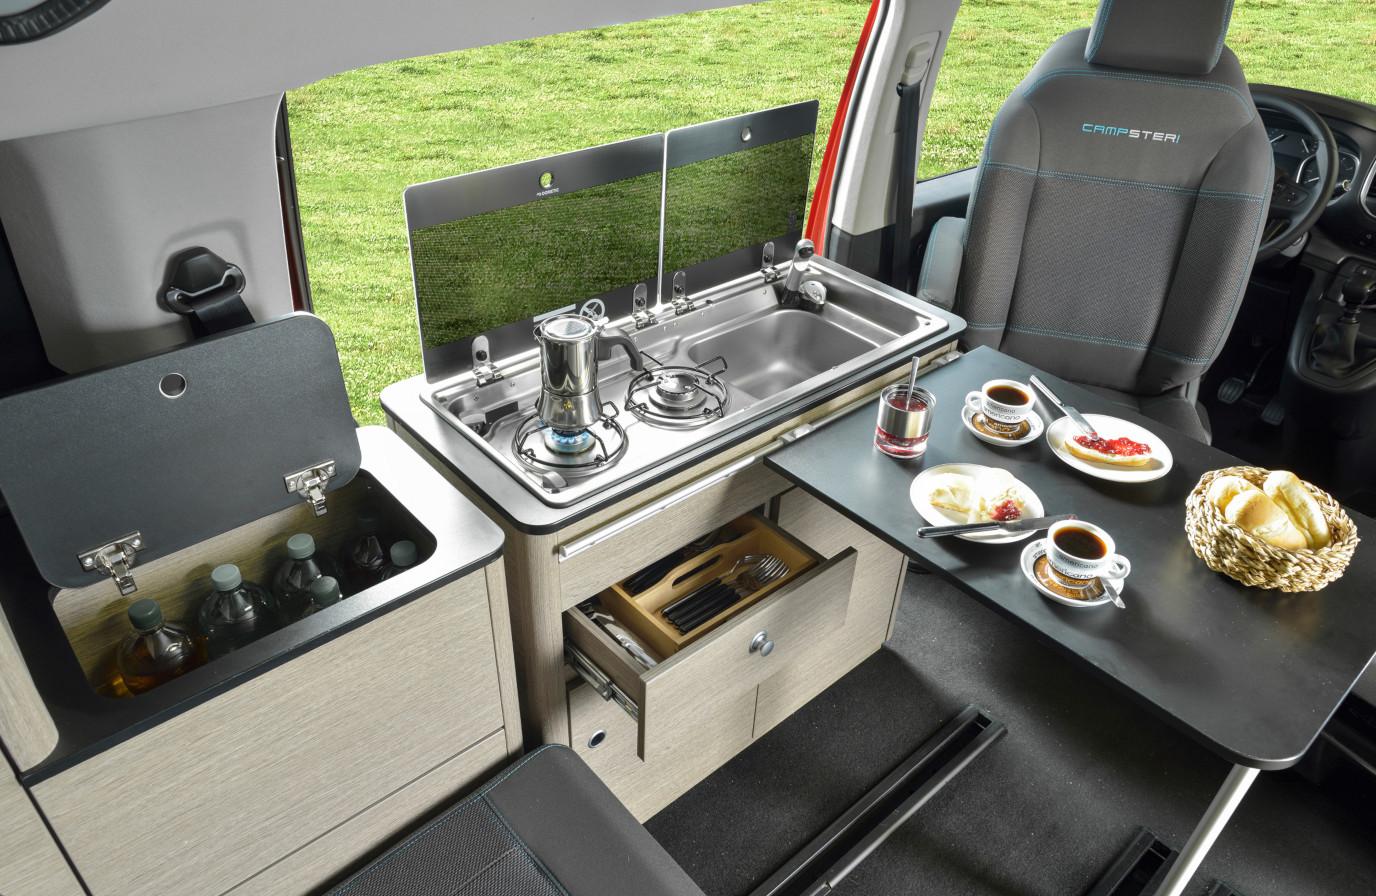 Mietwohnmobil Campster Küchenzeile